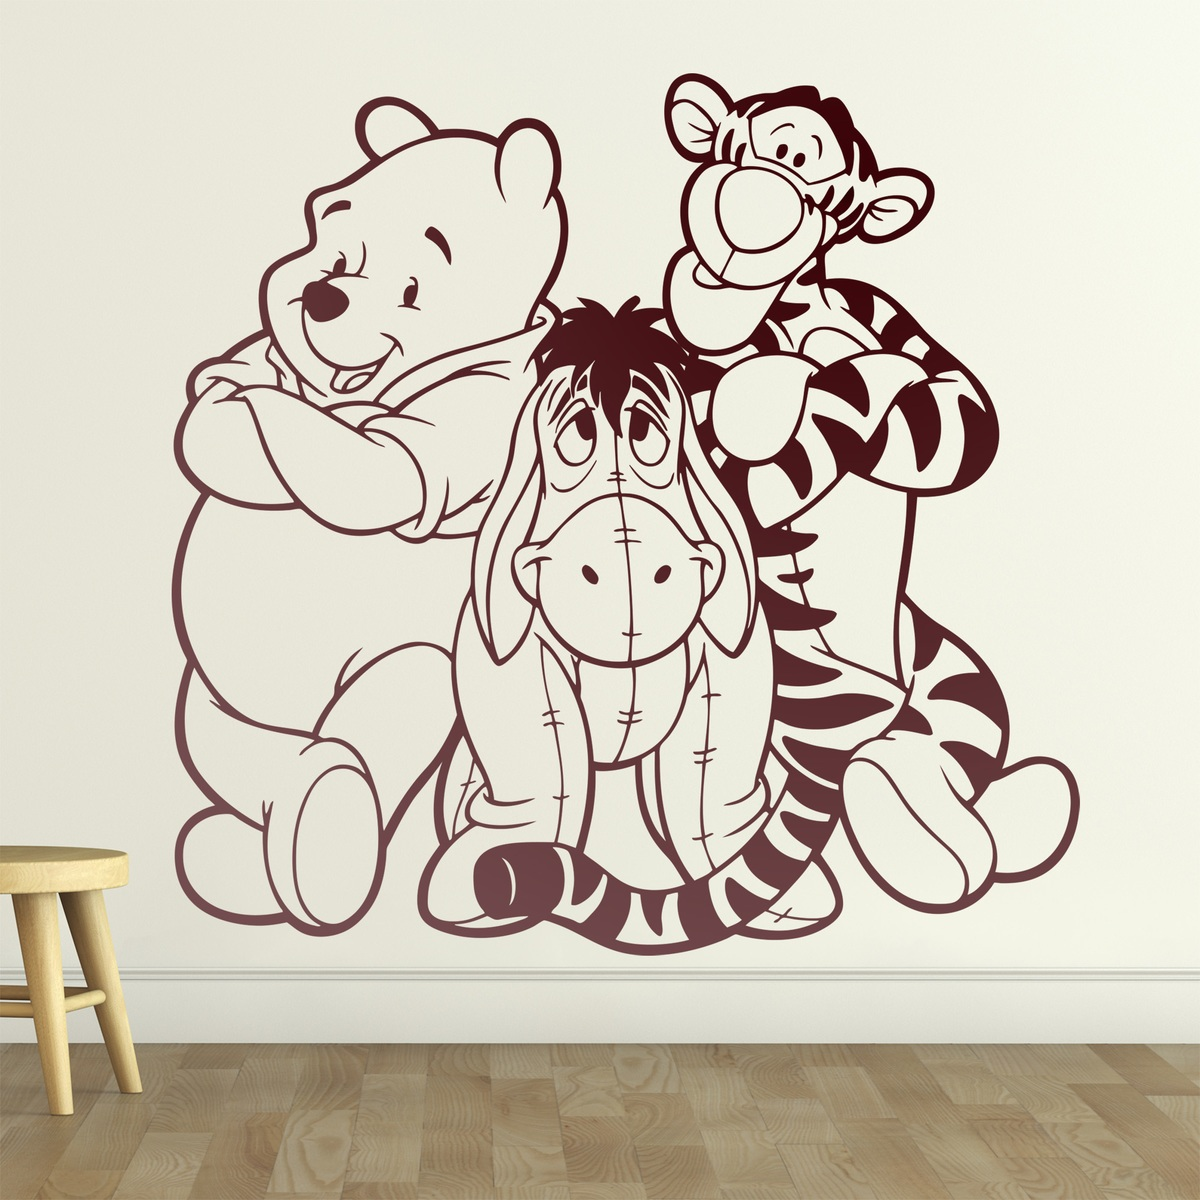 adesivo murale per bambini disney winnie the pooh. Black Bedroom Furniture Sets. Home Design Ideas